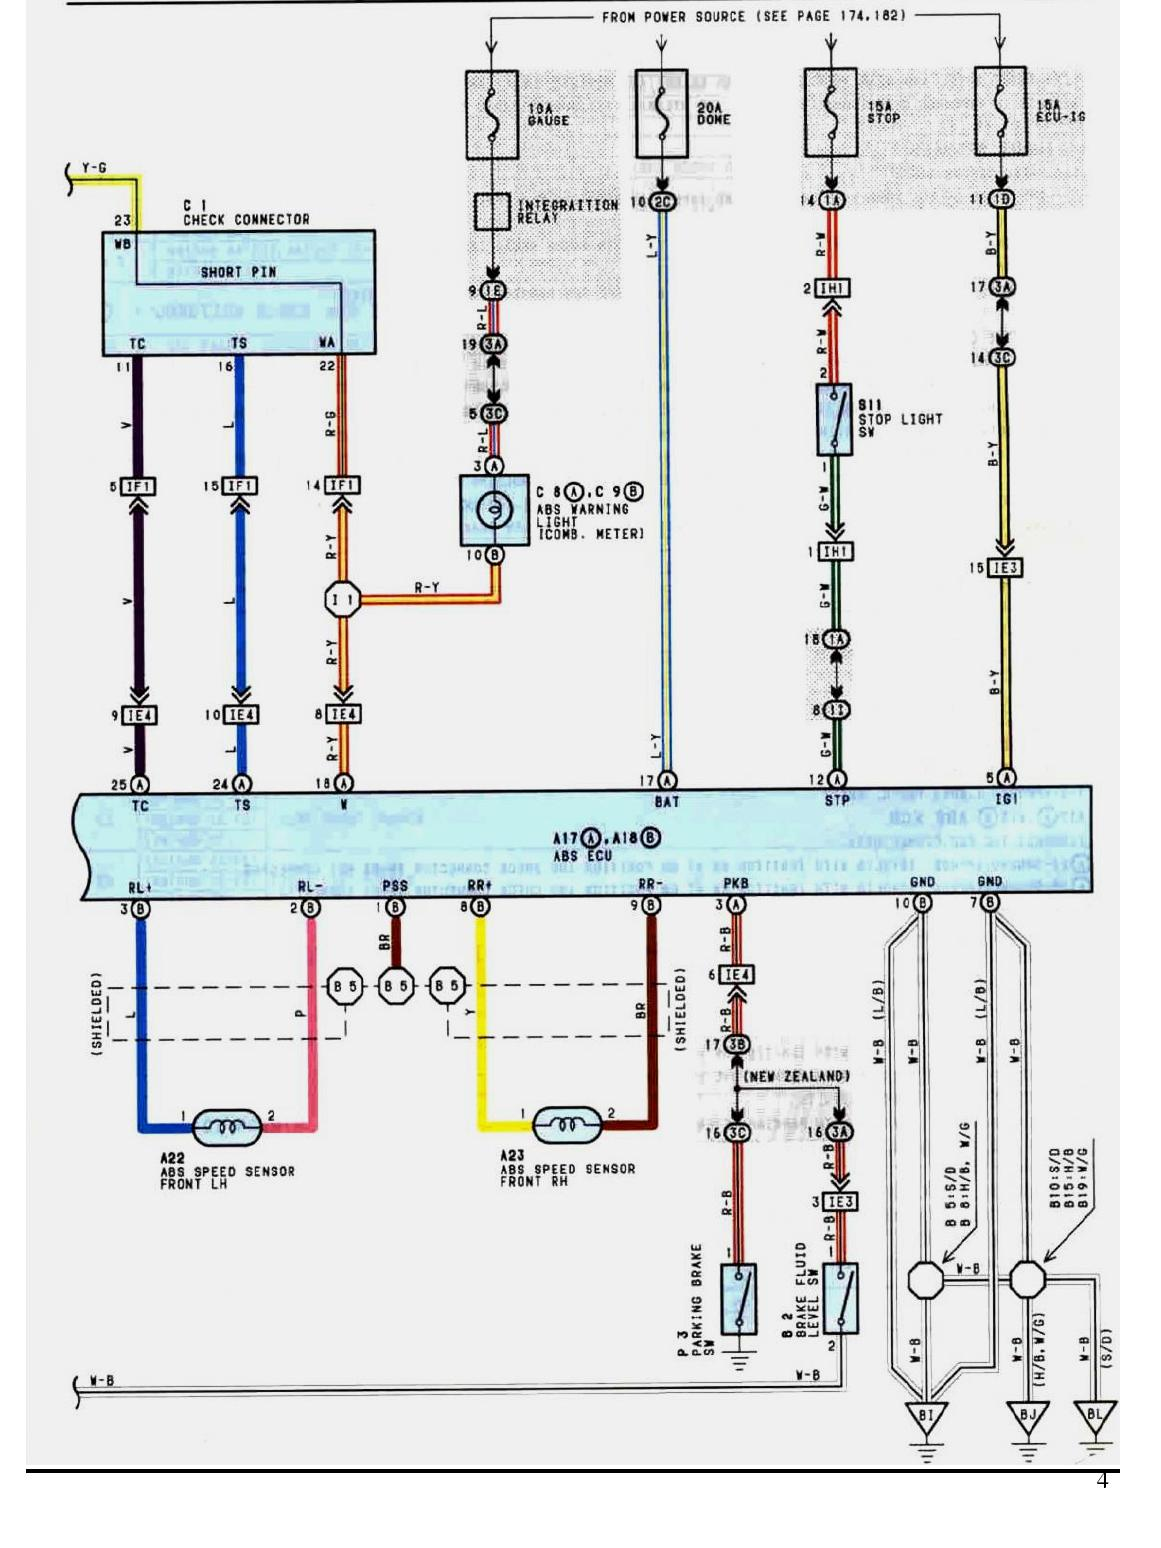 Code 3 Mx7000 Wiring erp data flow diagram Austin Mini Wiring Diagram